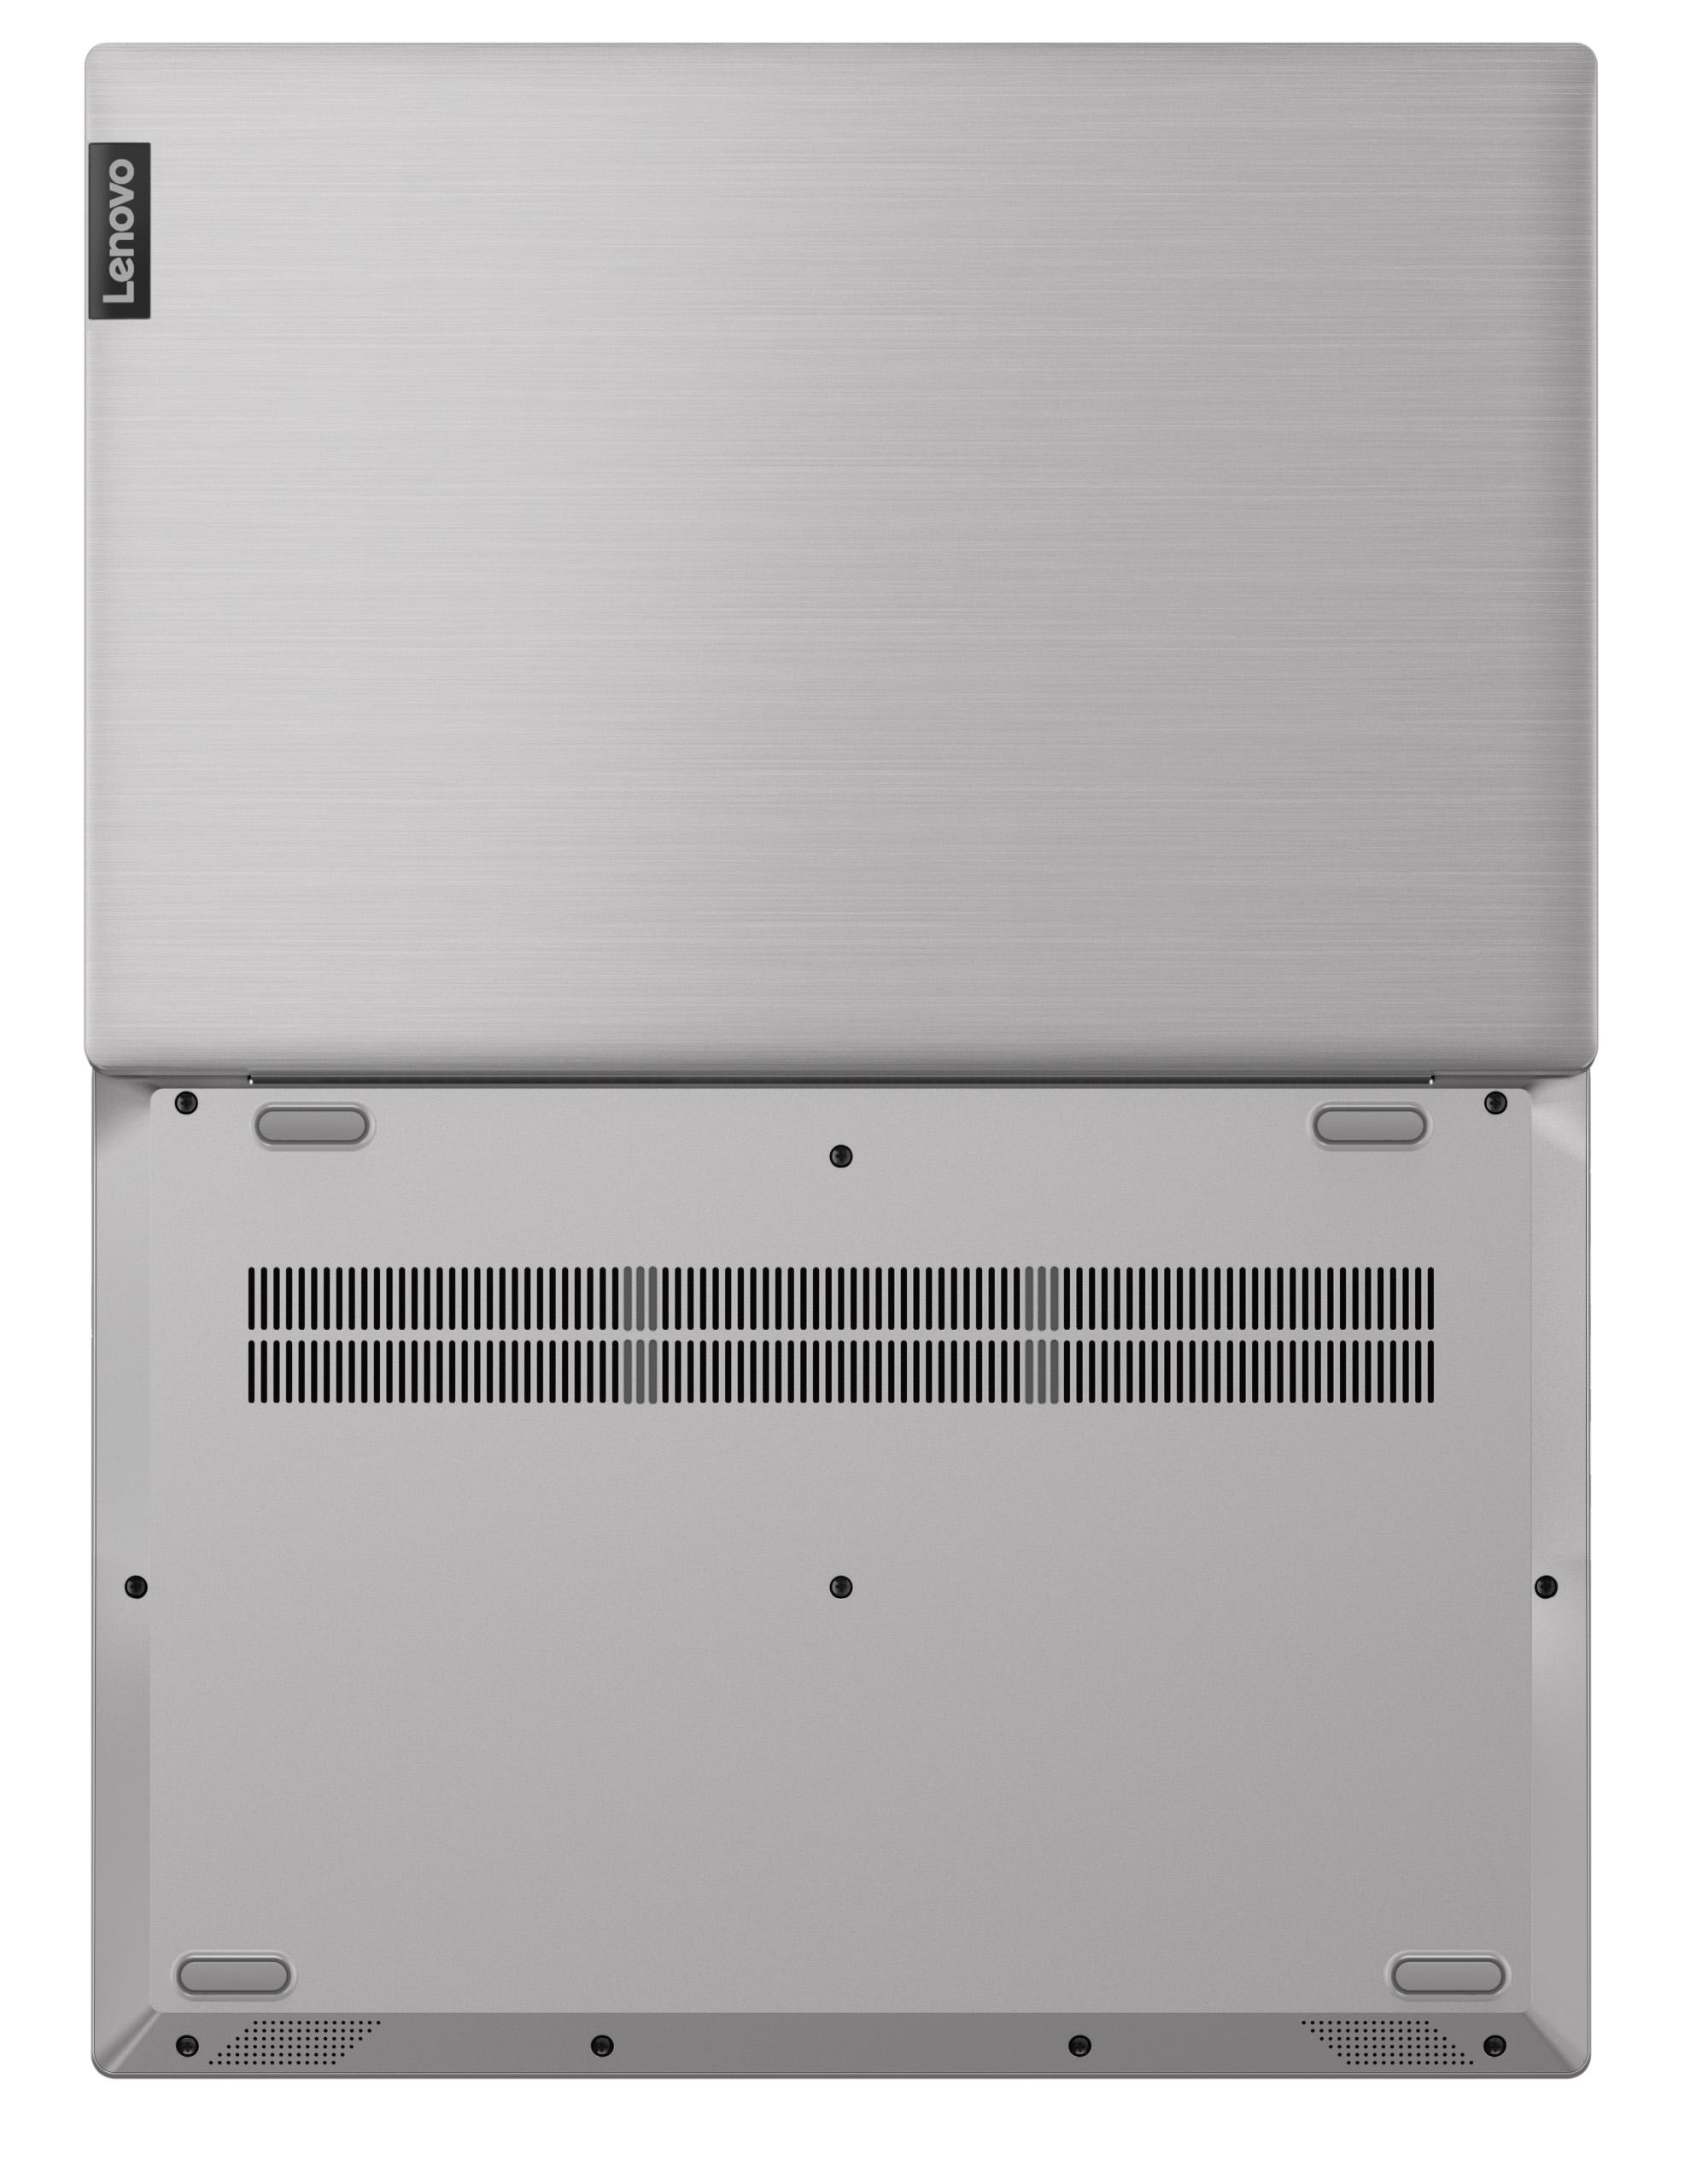 Фото  Ноутбук Lenovo ideapad S145-15IGM Grey  (81MX003QRE)